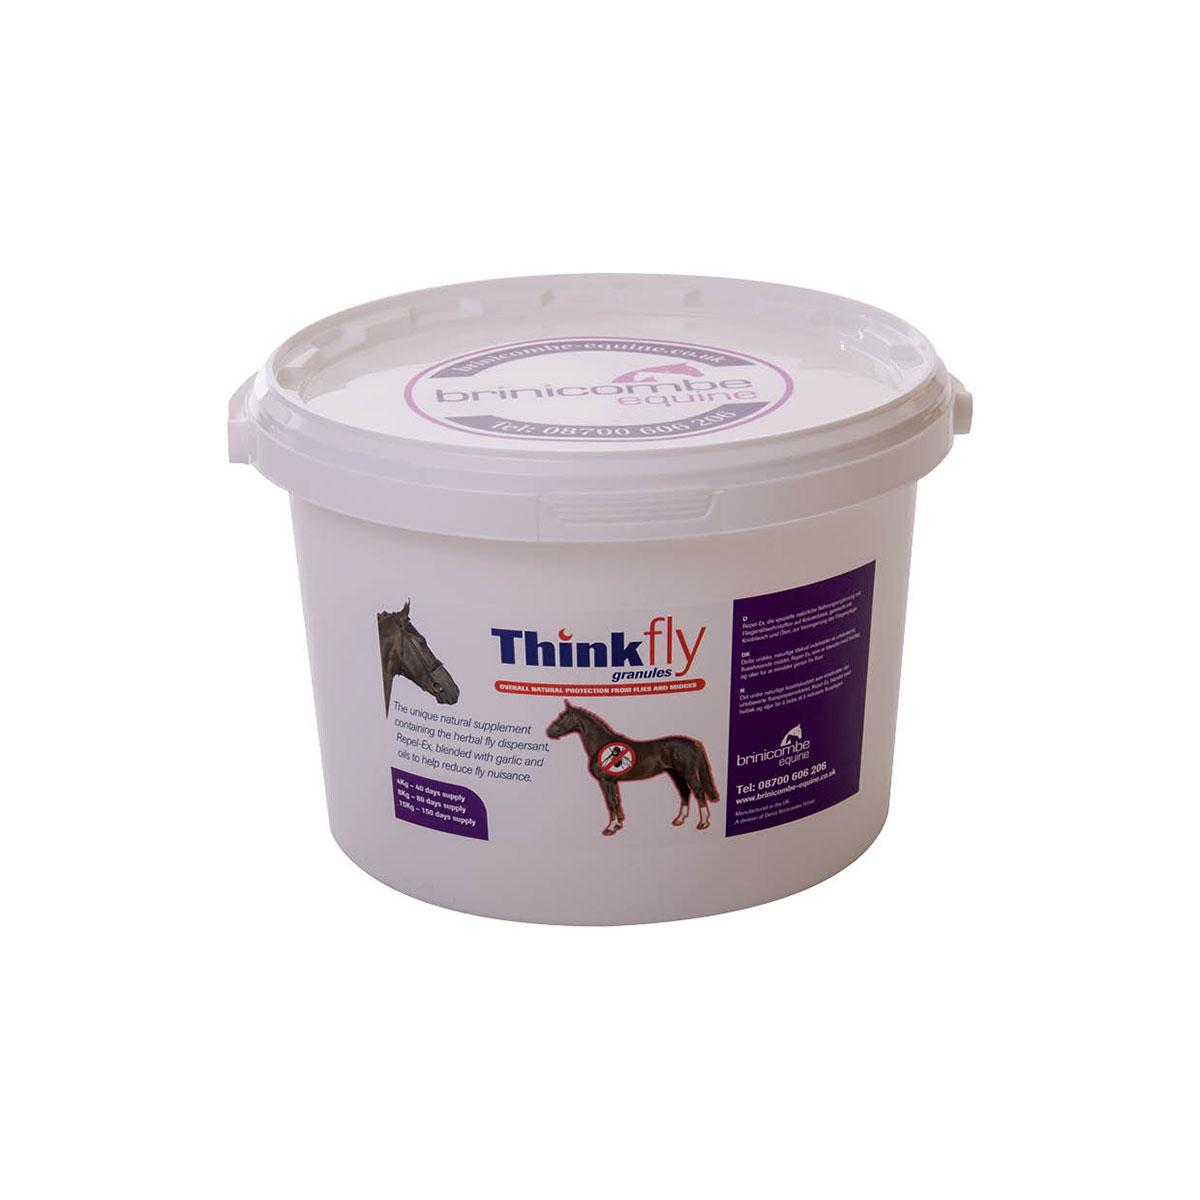 compl ment alimentaire en granul s anti mouches brinicombe equine think fly granules 8 kg horze. Black Bedroom Furniture Sets. Home Design Ideas